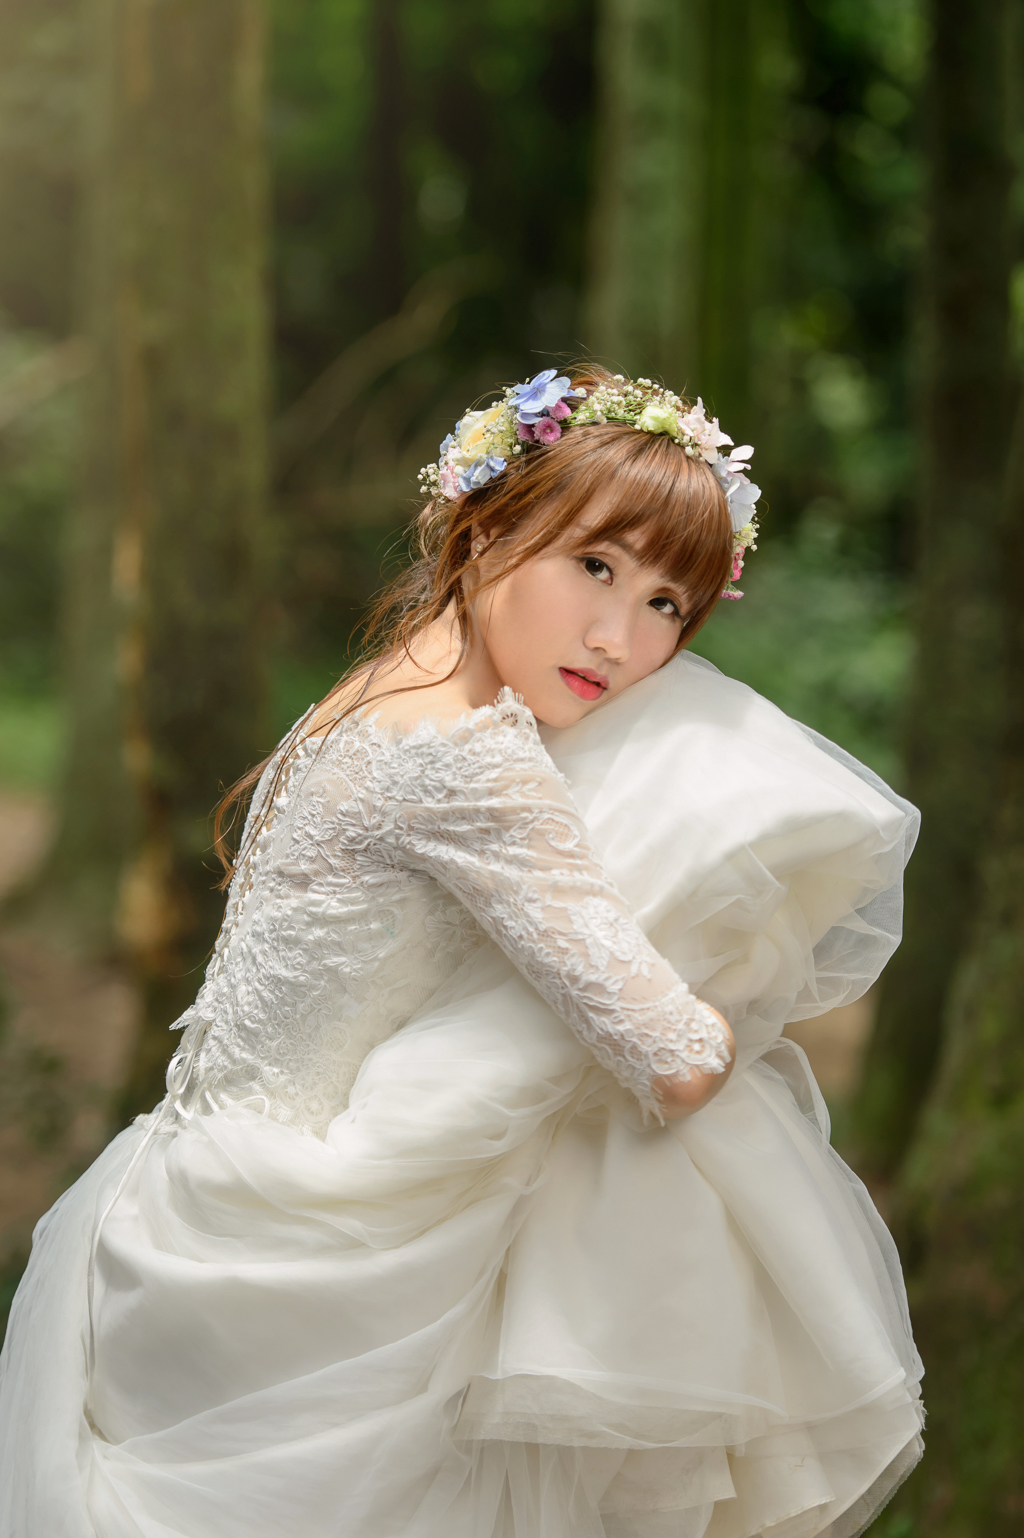 婚攝小勇, 小寶團隊, 自助婚紗, niniko, wedding day-004